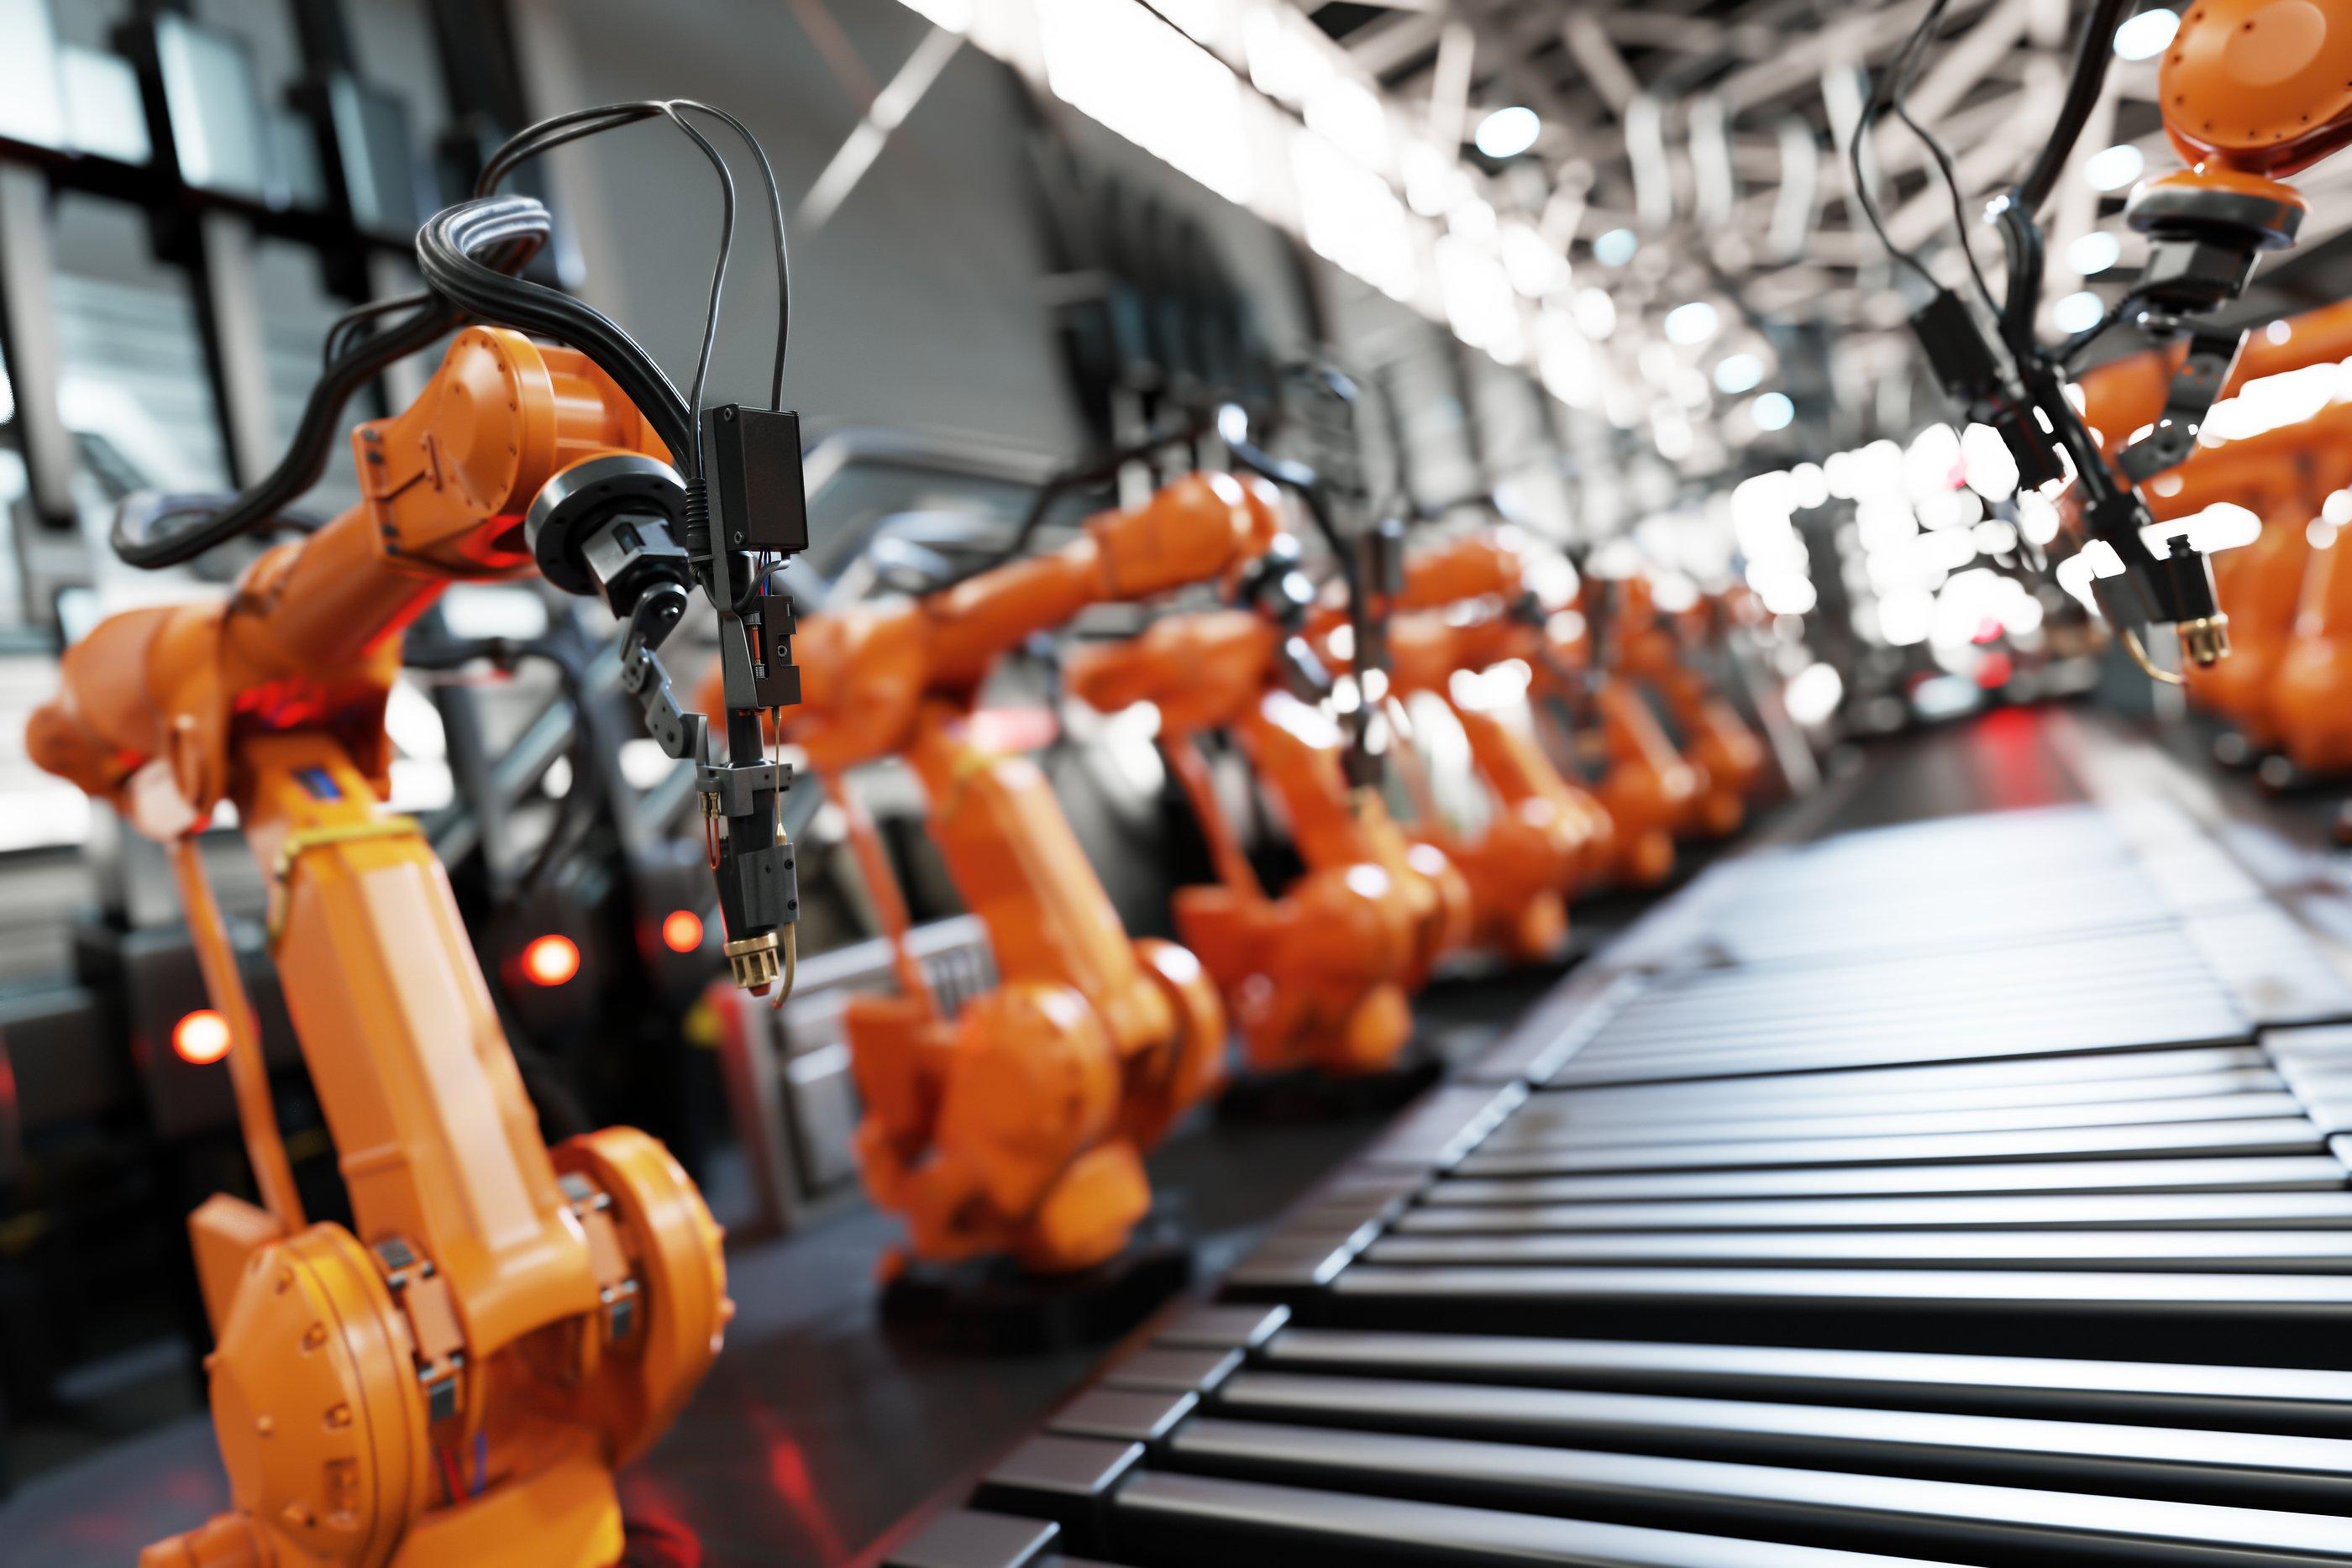 bigstock-Robotic-arms-along-assembly-li-353735198